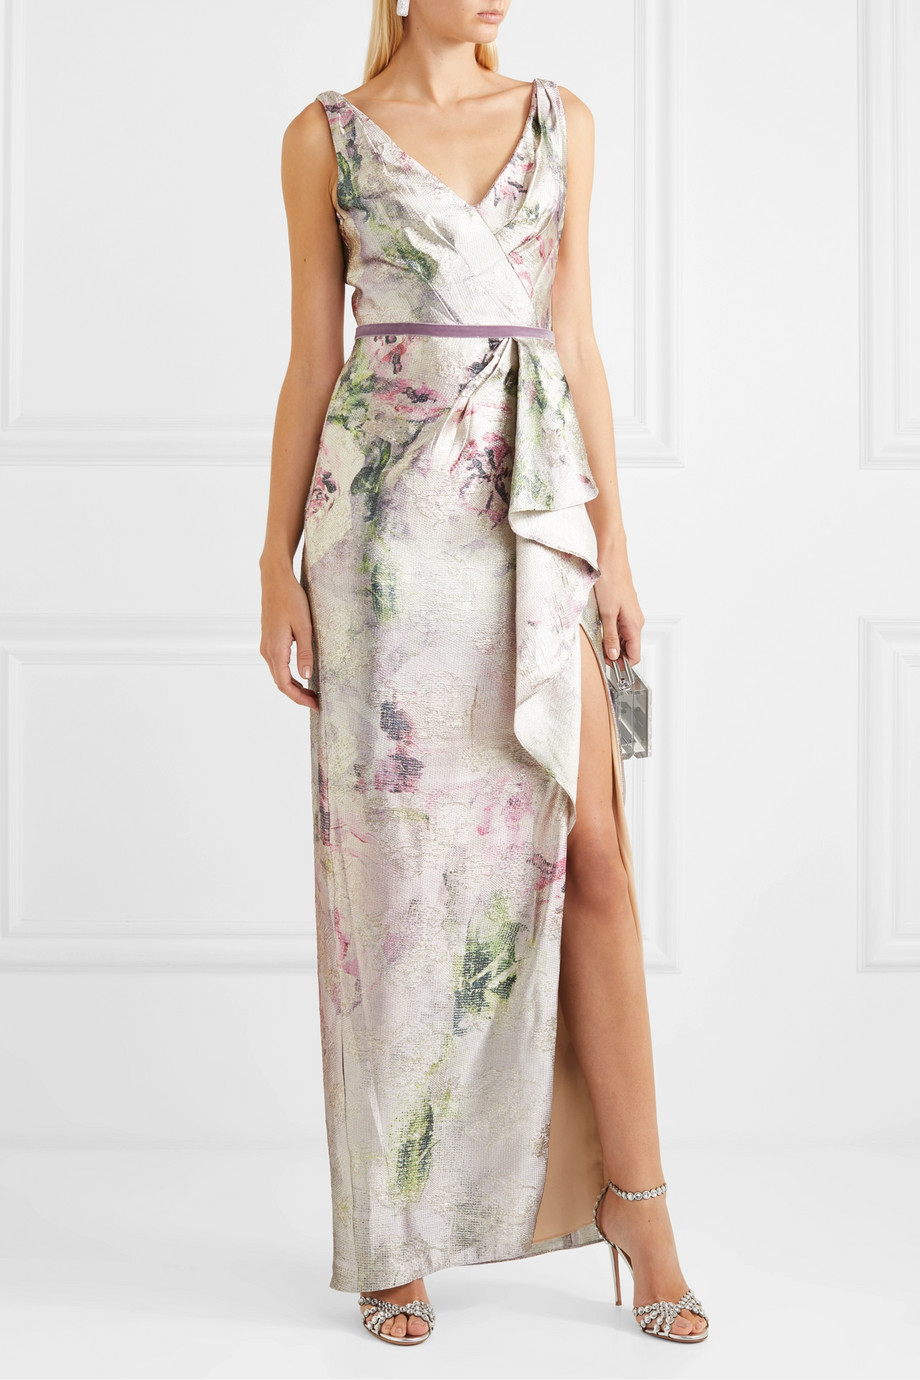 Marchesa Notte Draped velvet-trimmed metallic jacquard gown